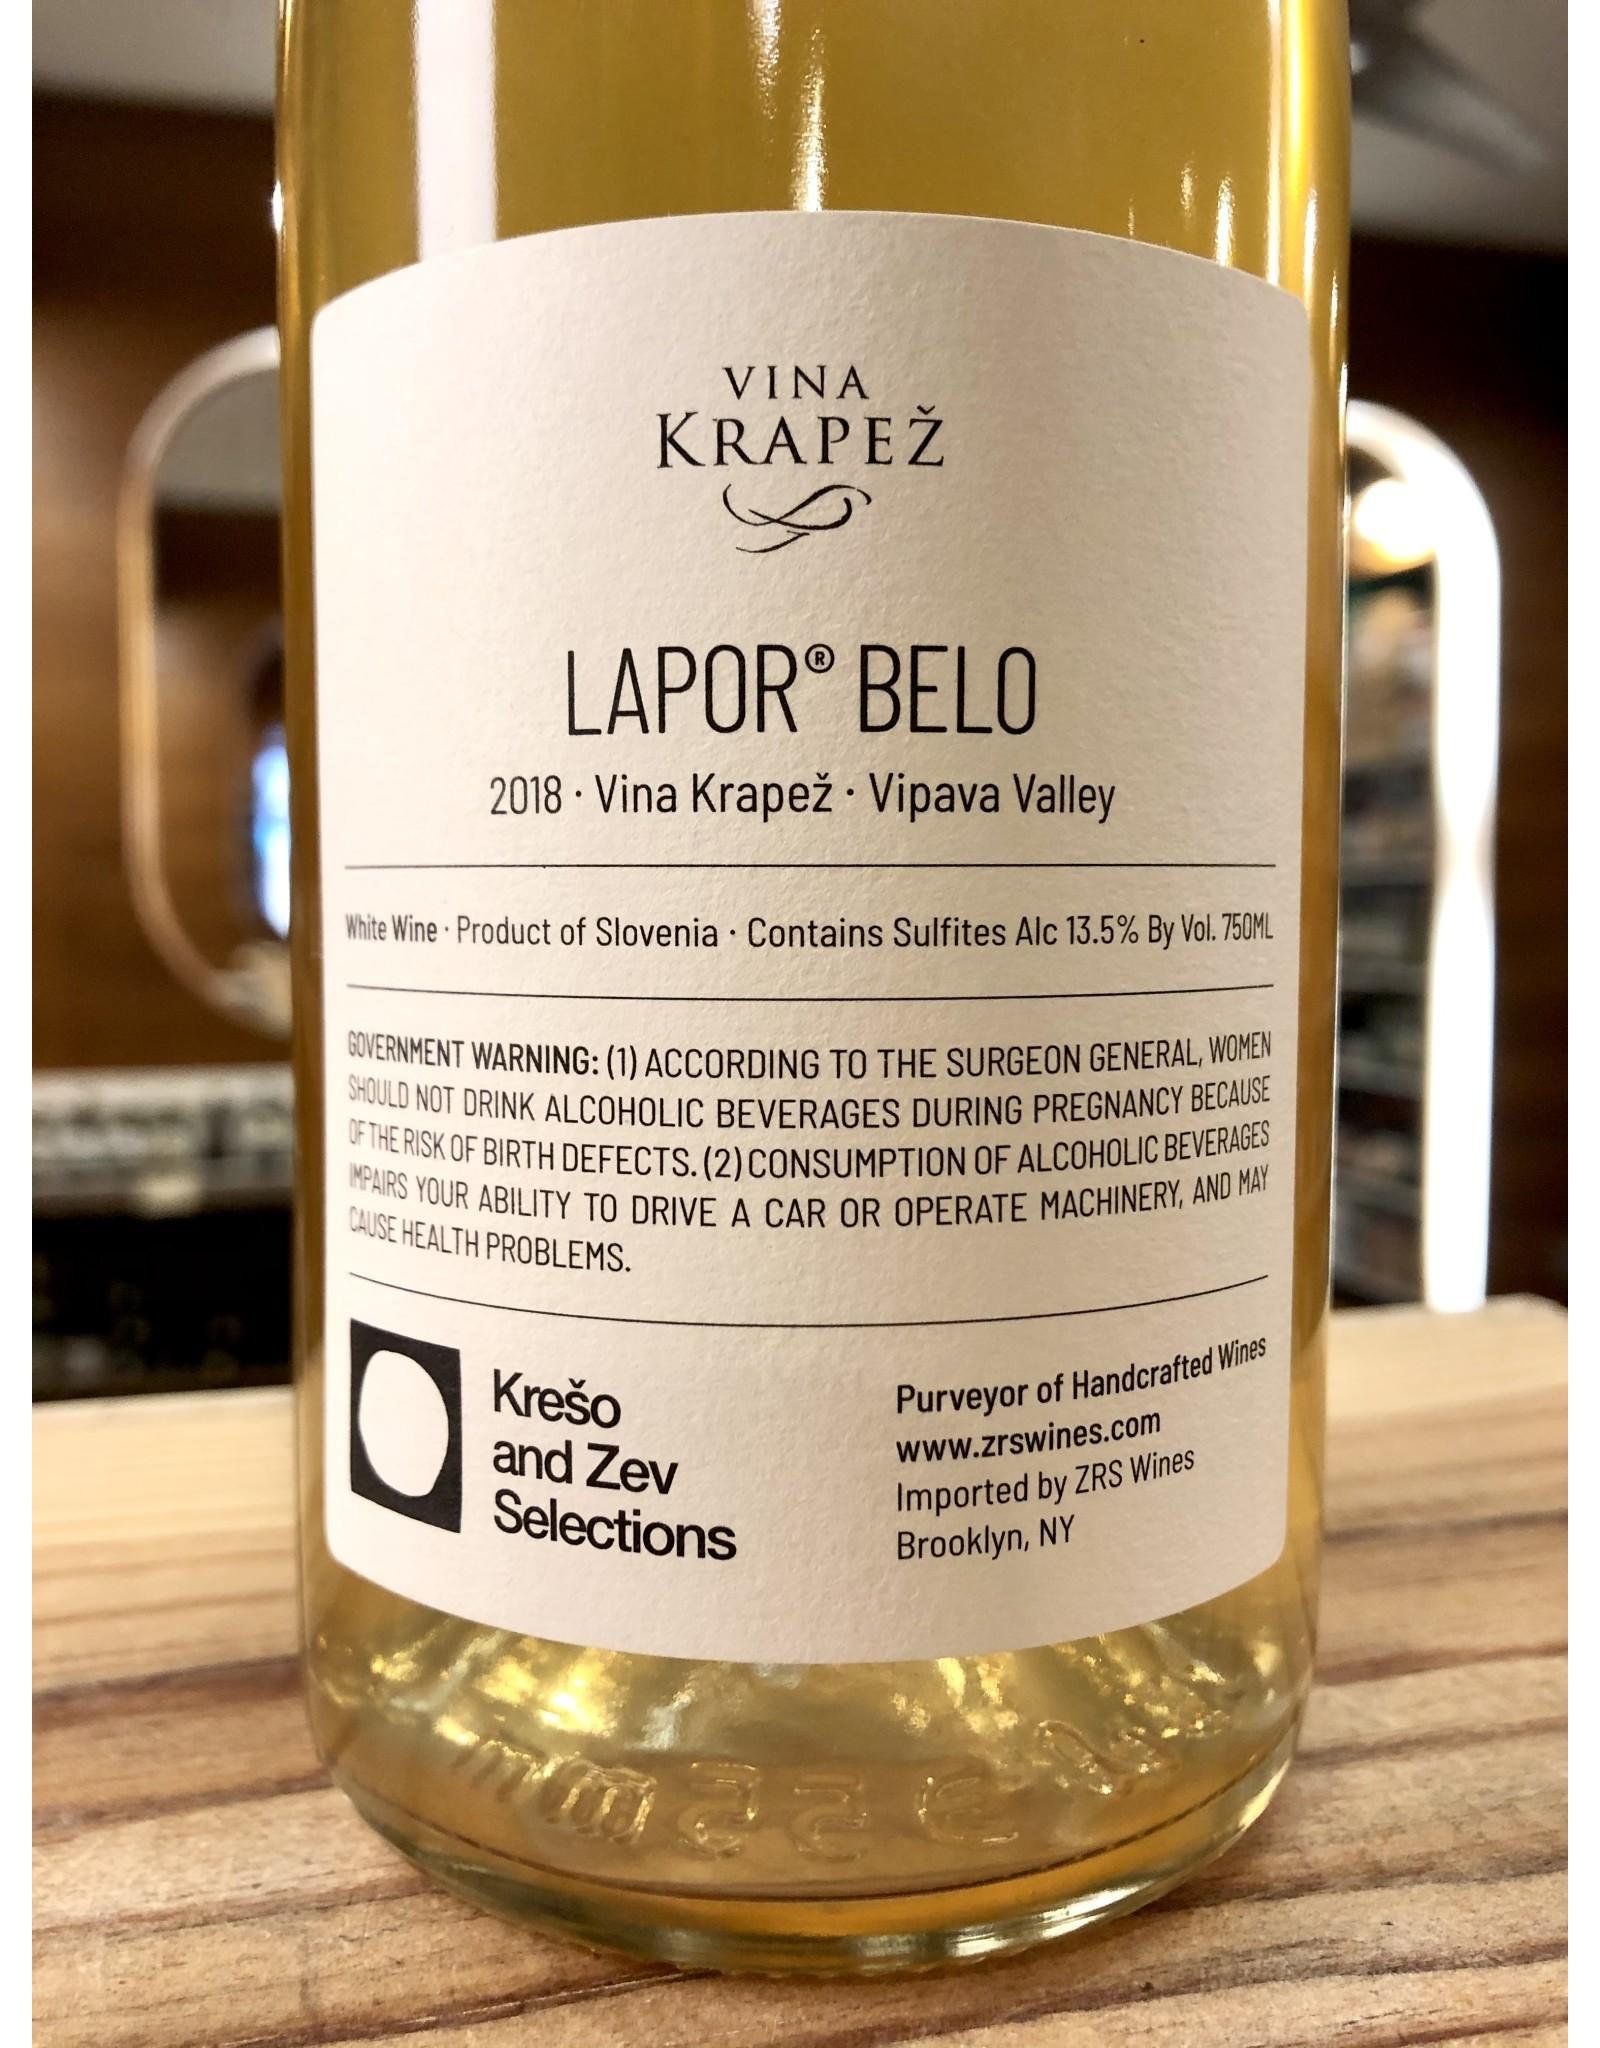 Vina Krapez Lapor Belo - 750 ML